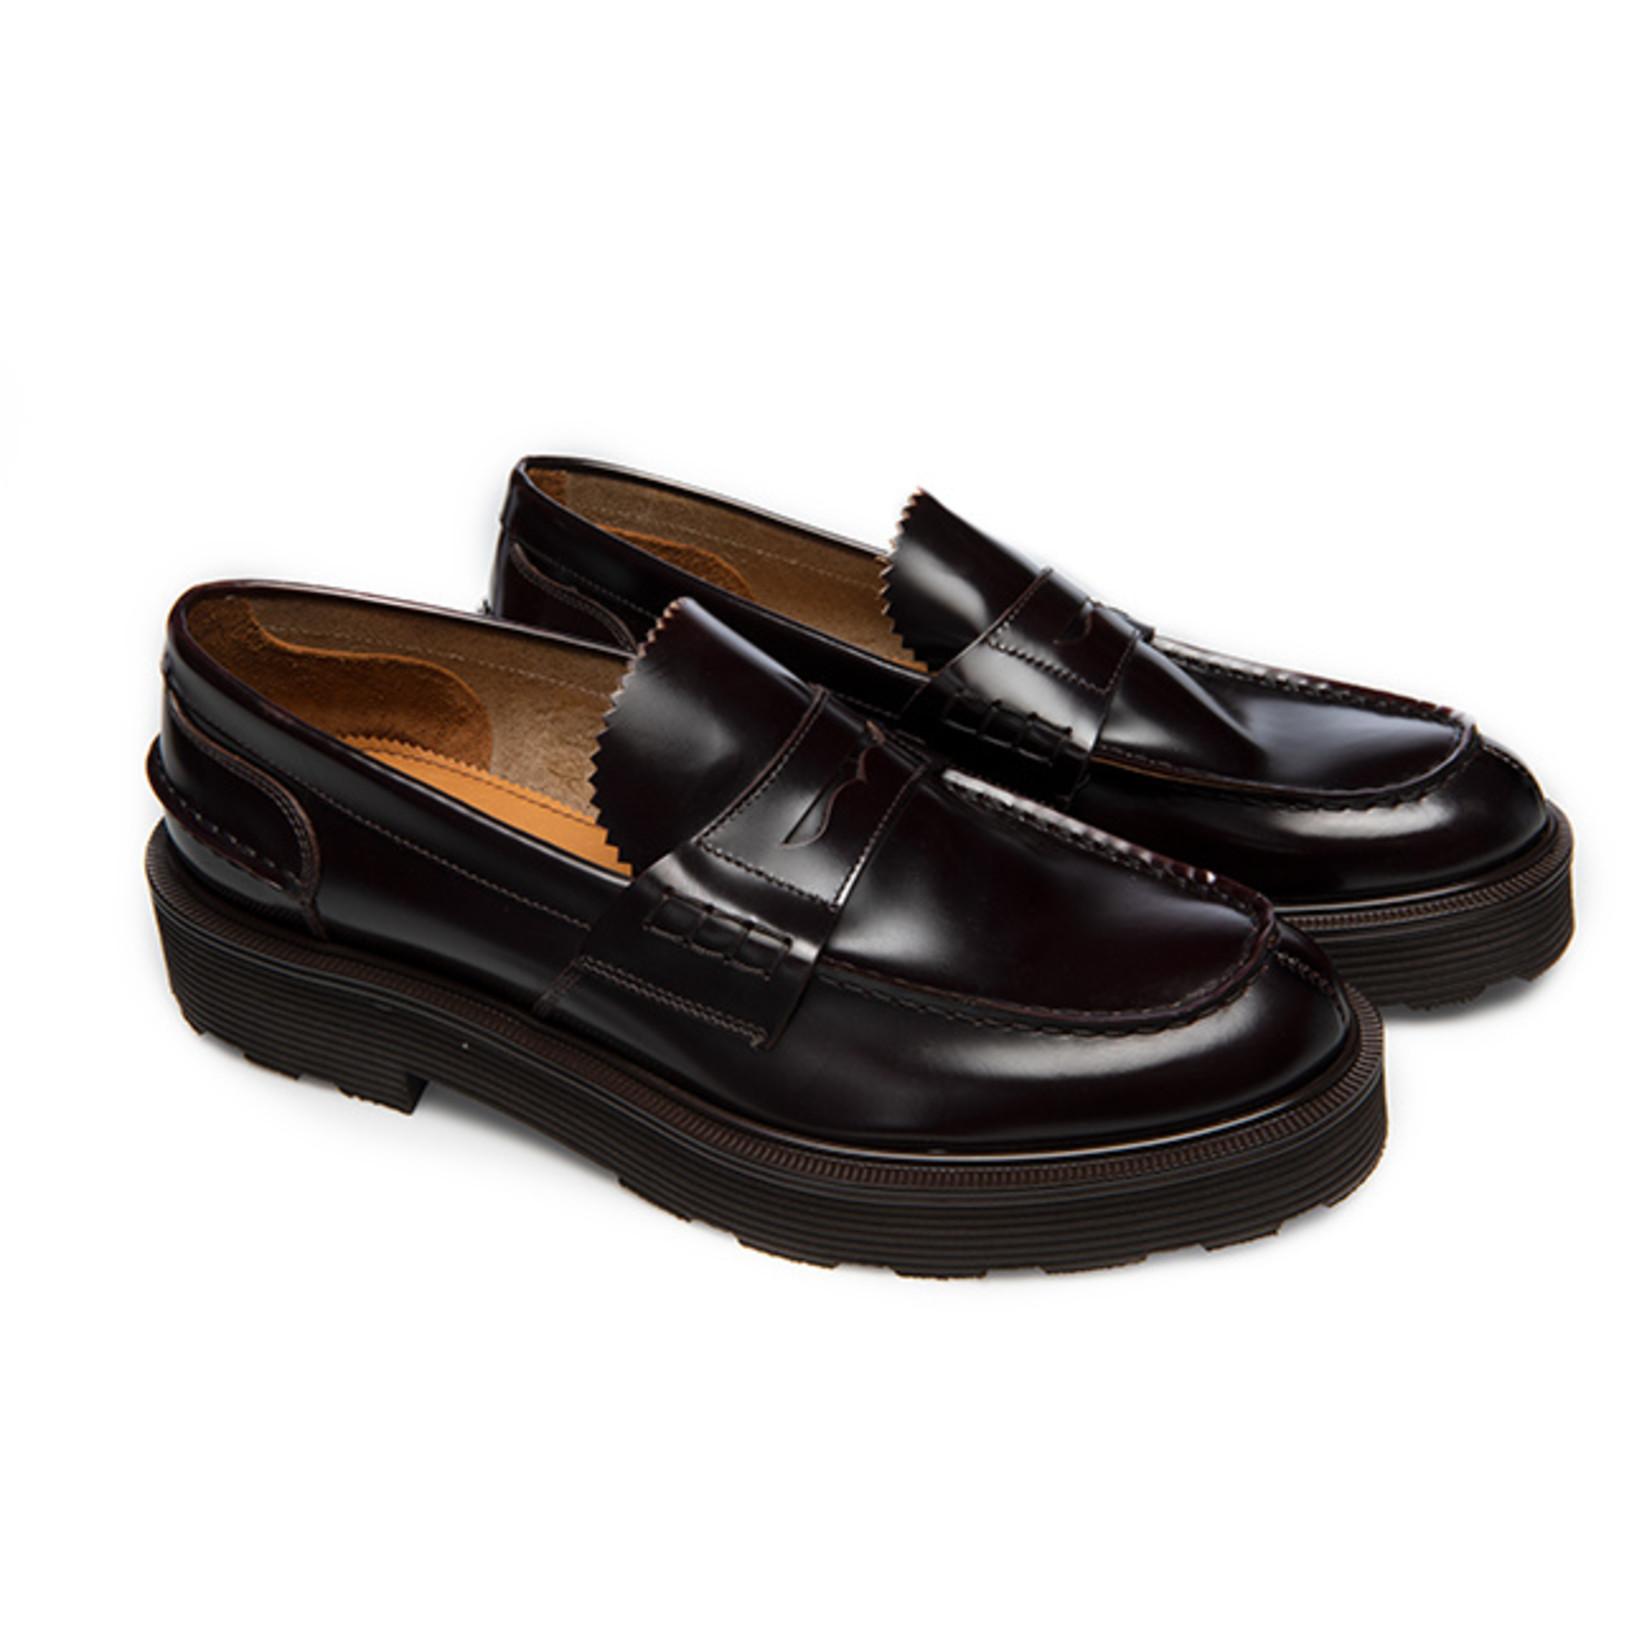 Sturlini Loafer